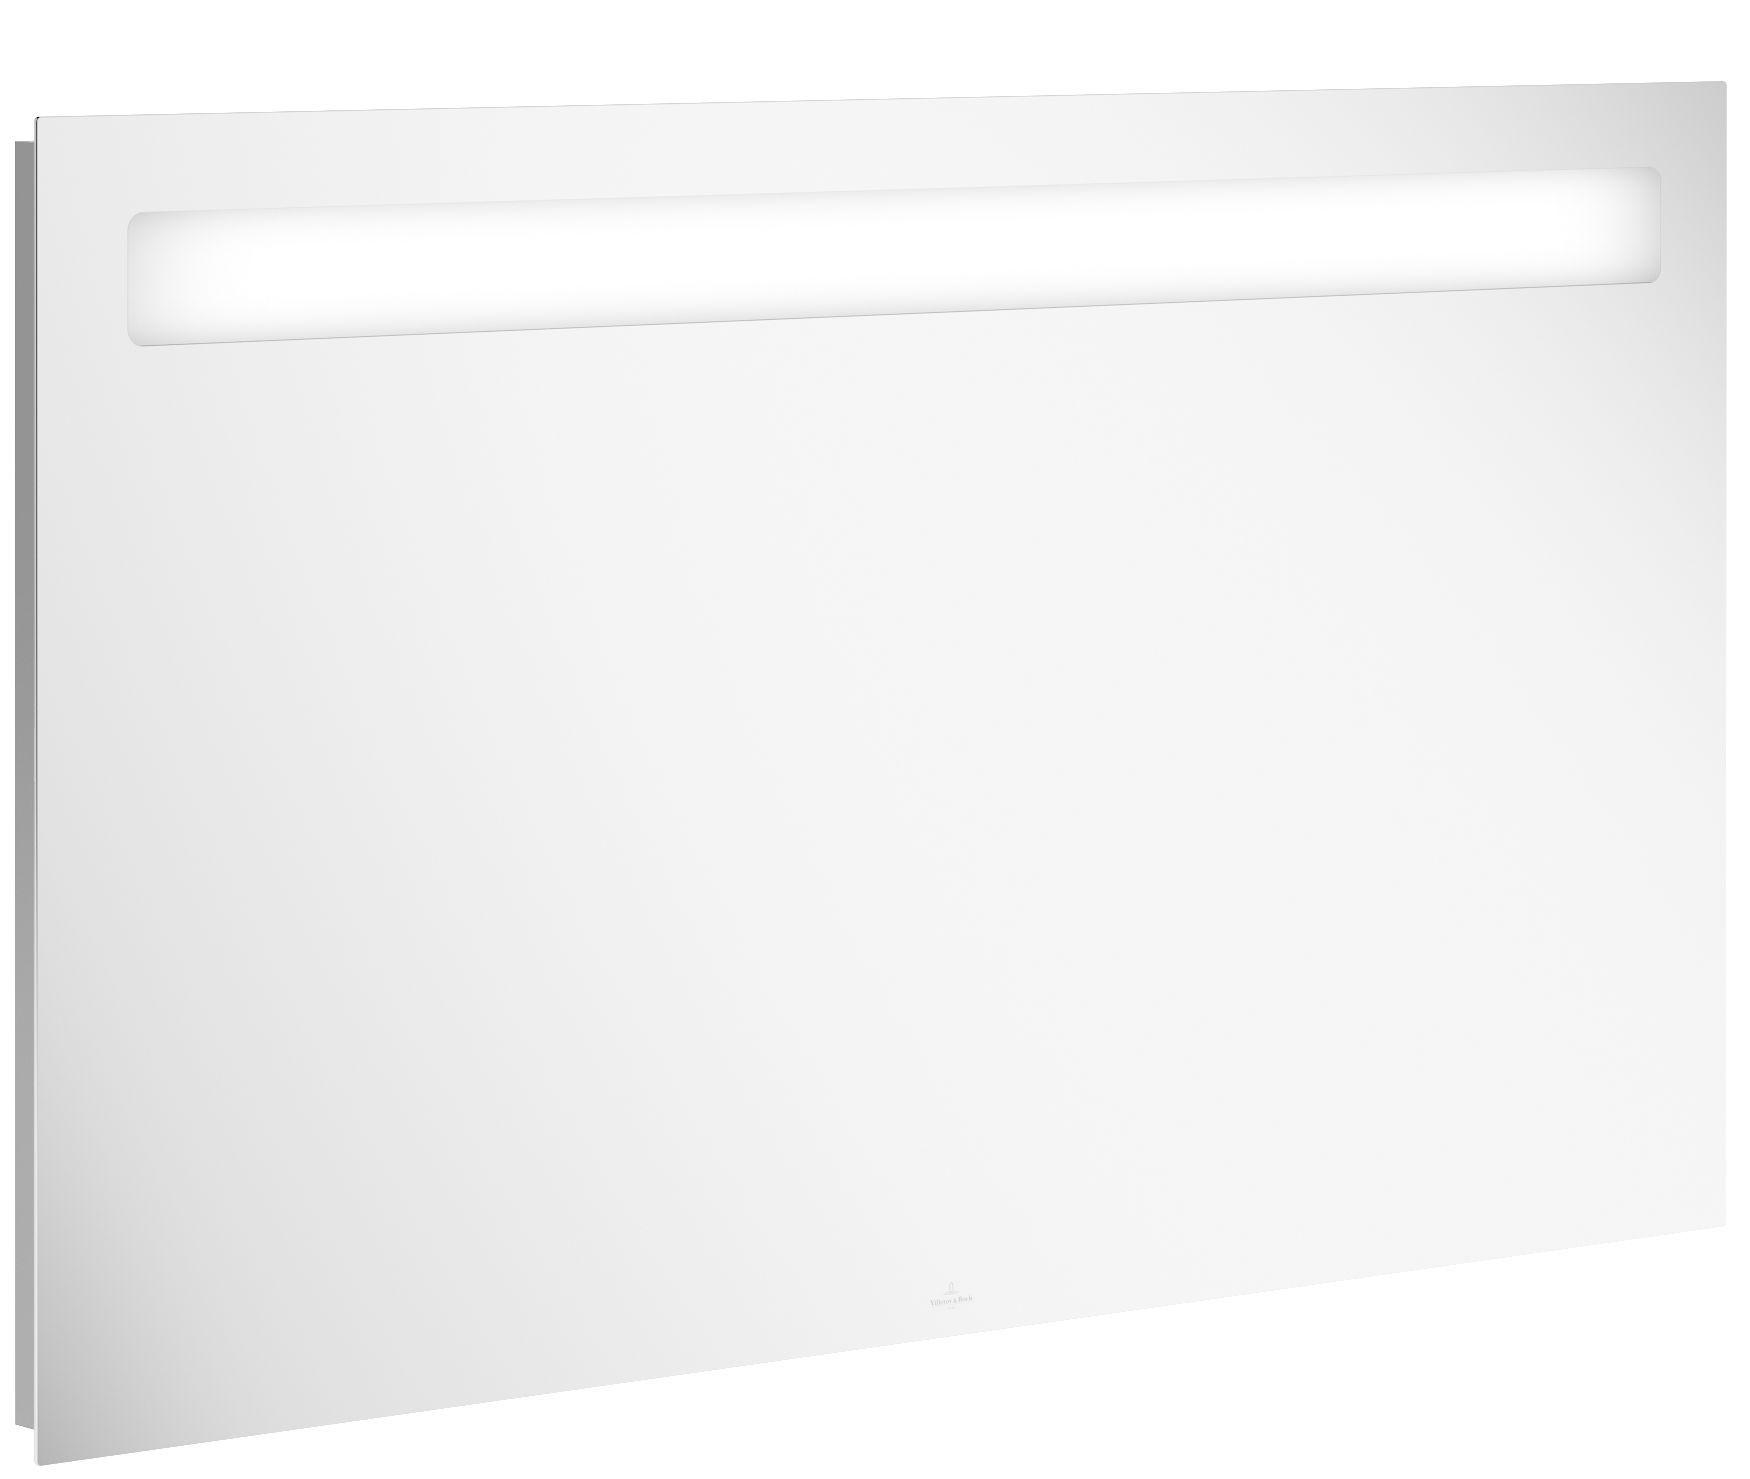 Villeroy & Boch More to See 14 Spiegel mit Beleuchtung  B:120xH:75xT:4,7cm A4321200